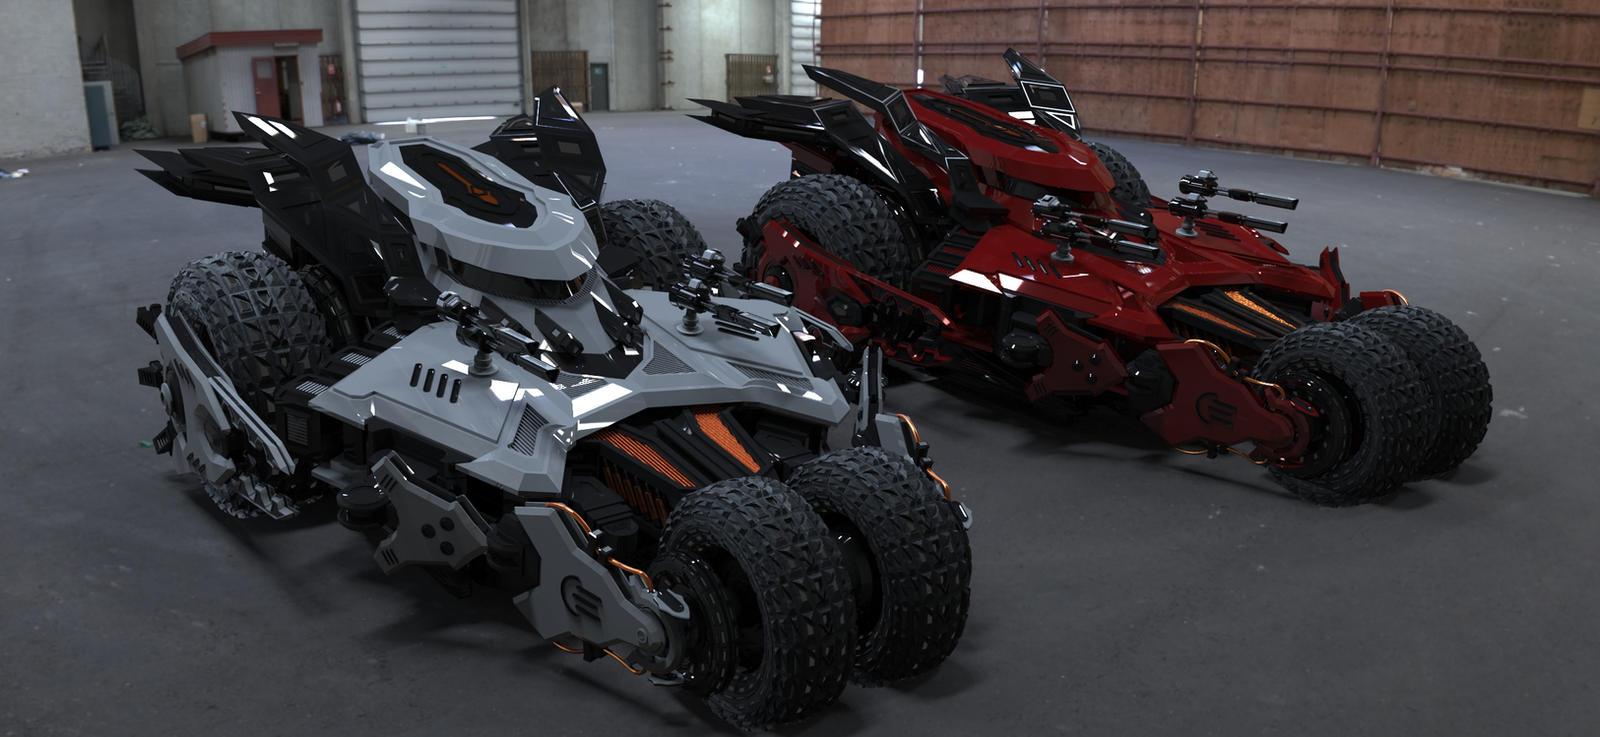 4 wheel armored car (Render Version 2) by pauldavemalla